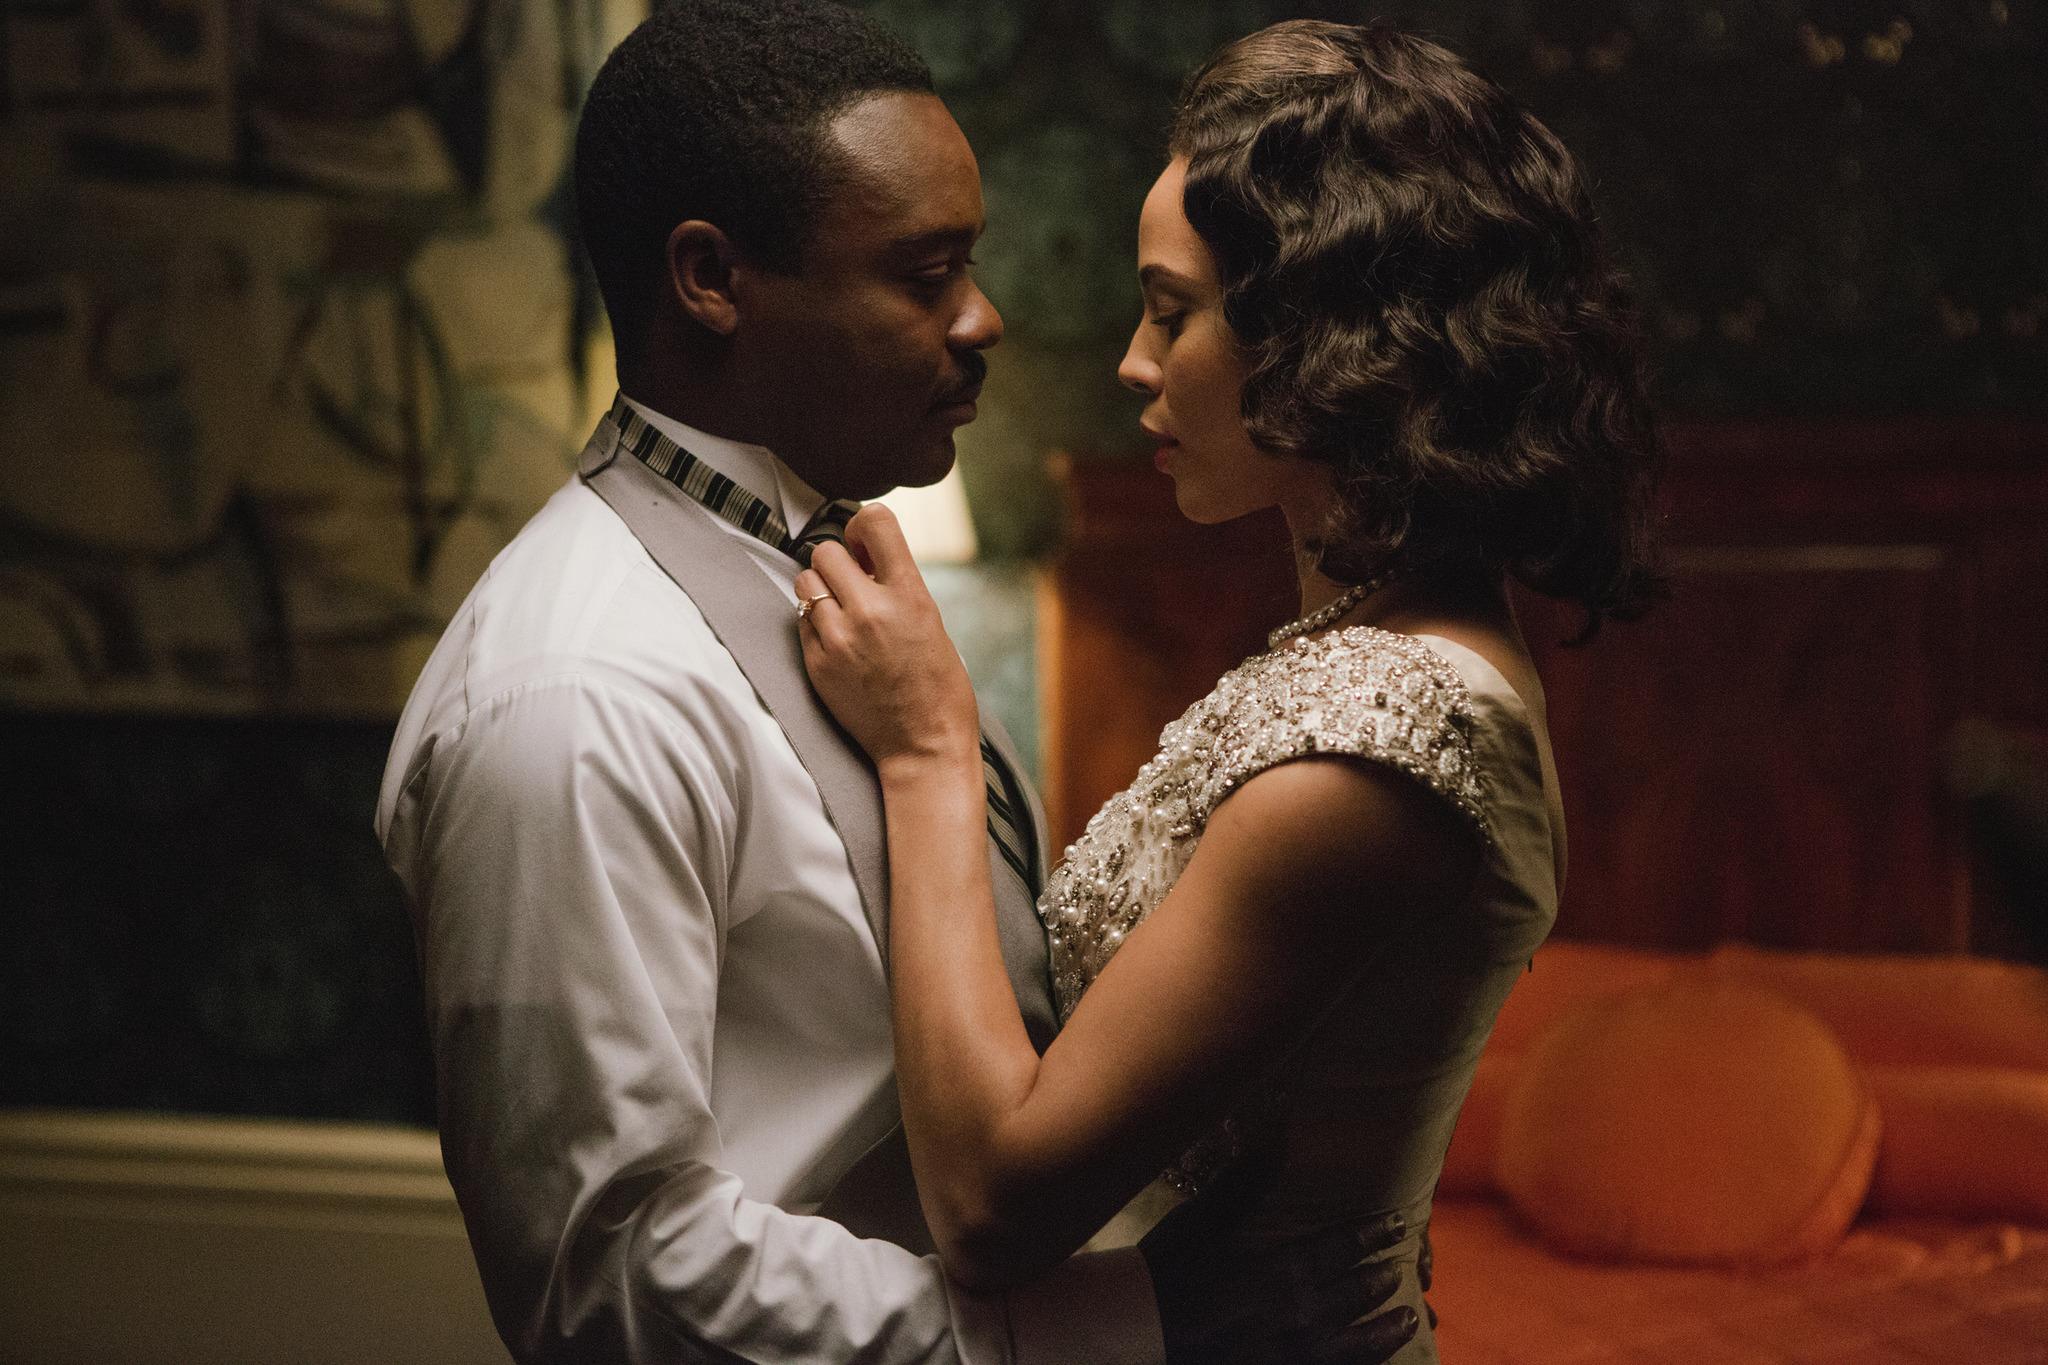 Carmen Ejogo and David Oyelowo in Selma (2014)